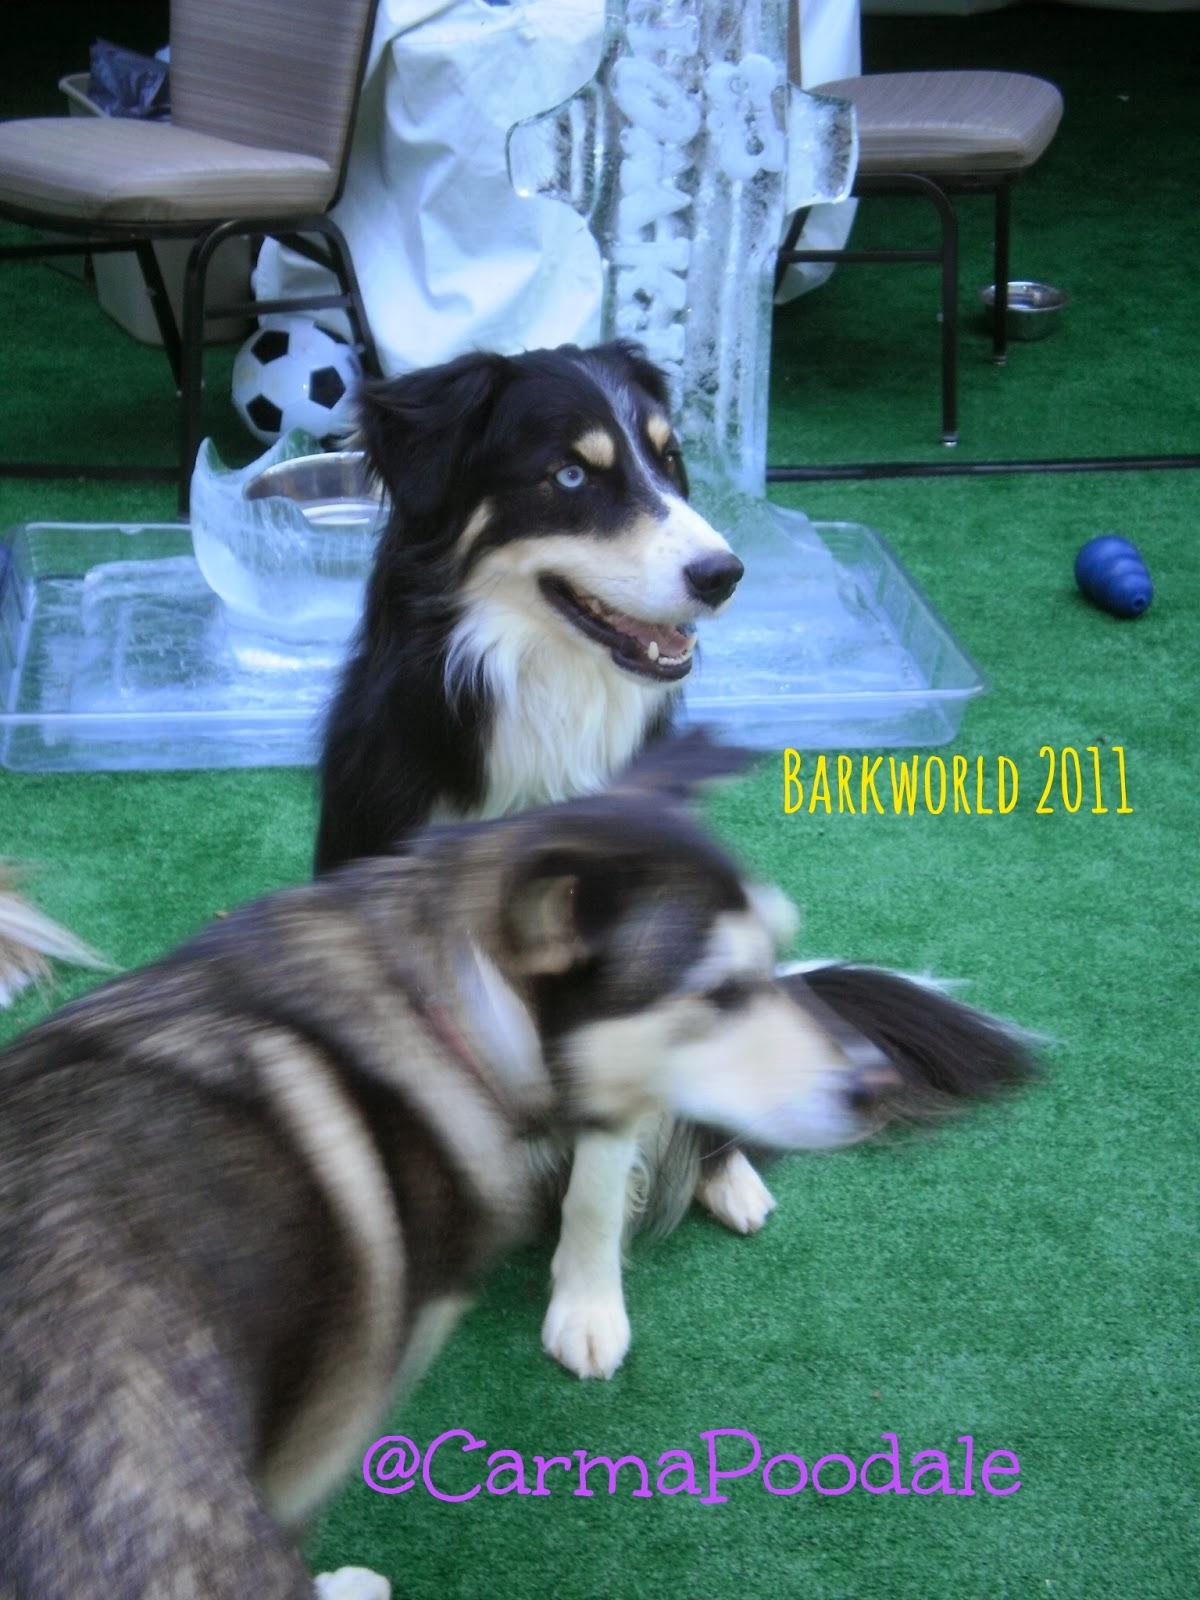 McGrady at Barkworld 2011